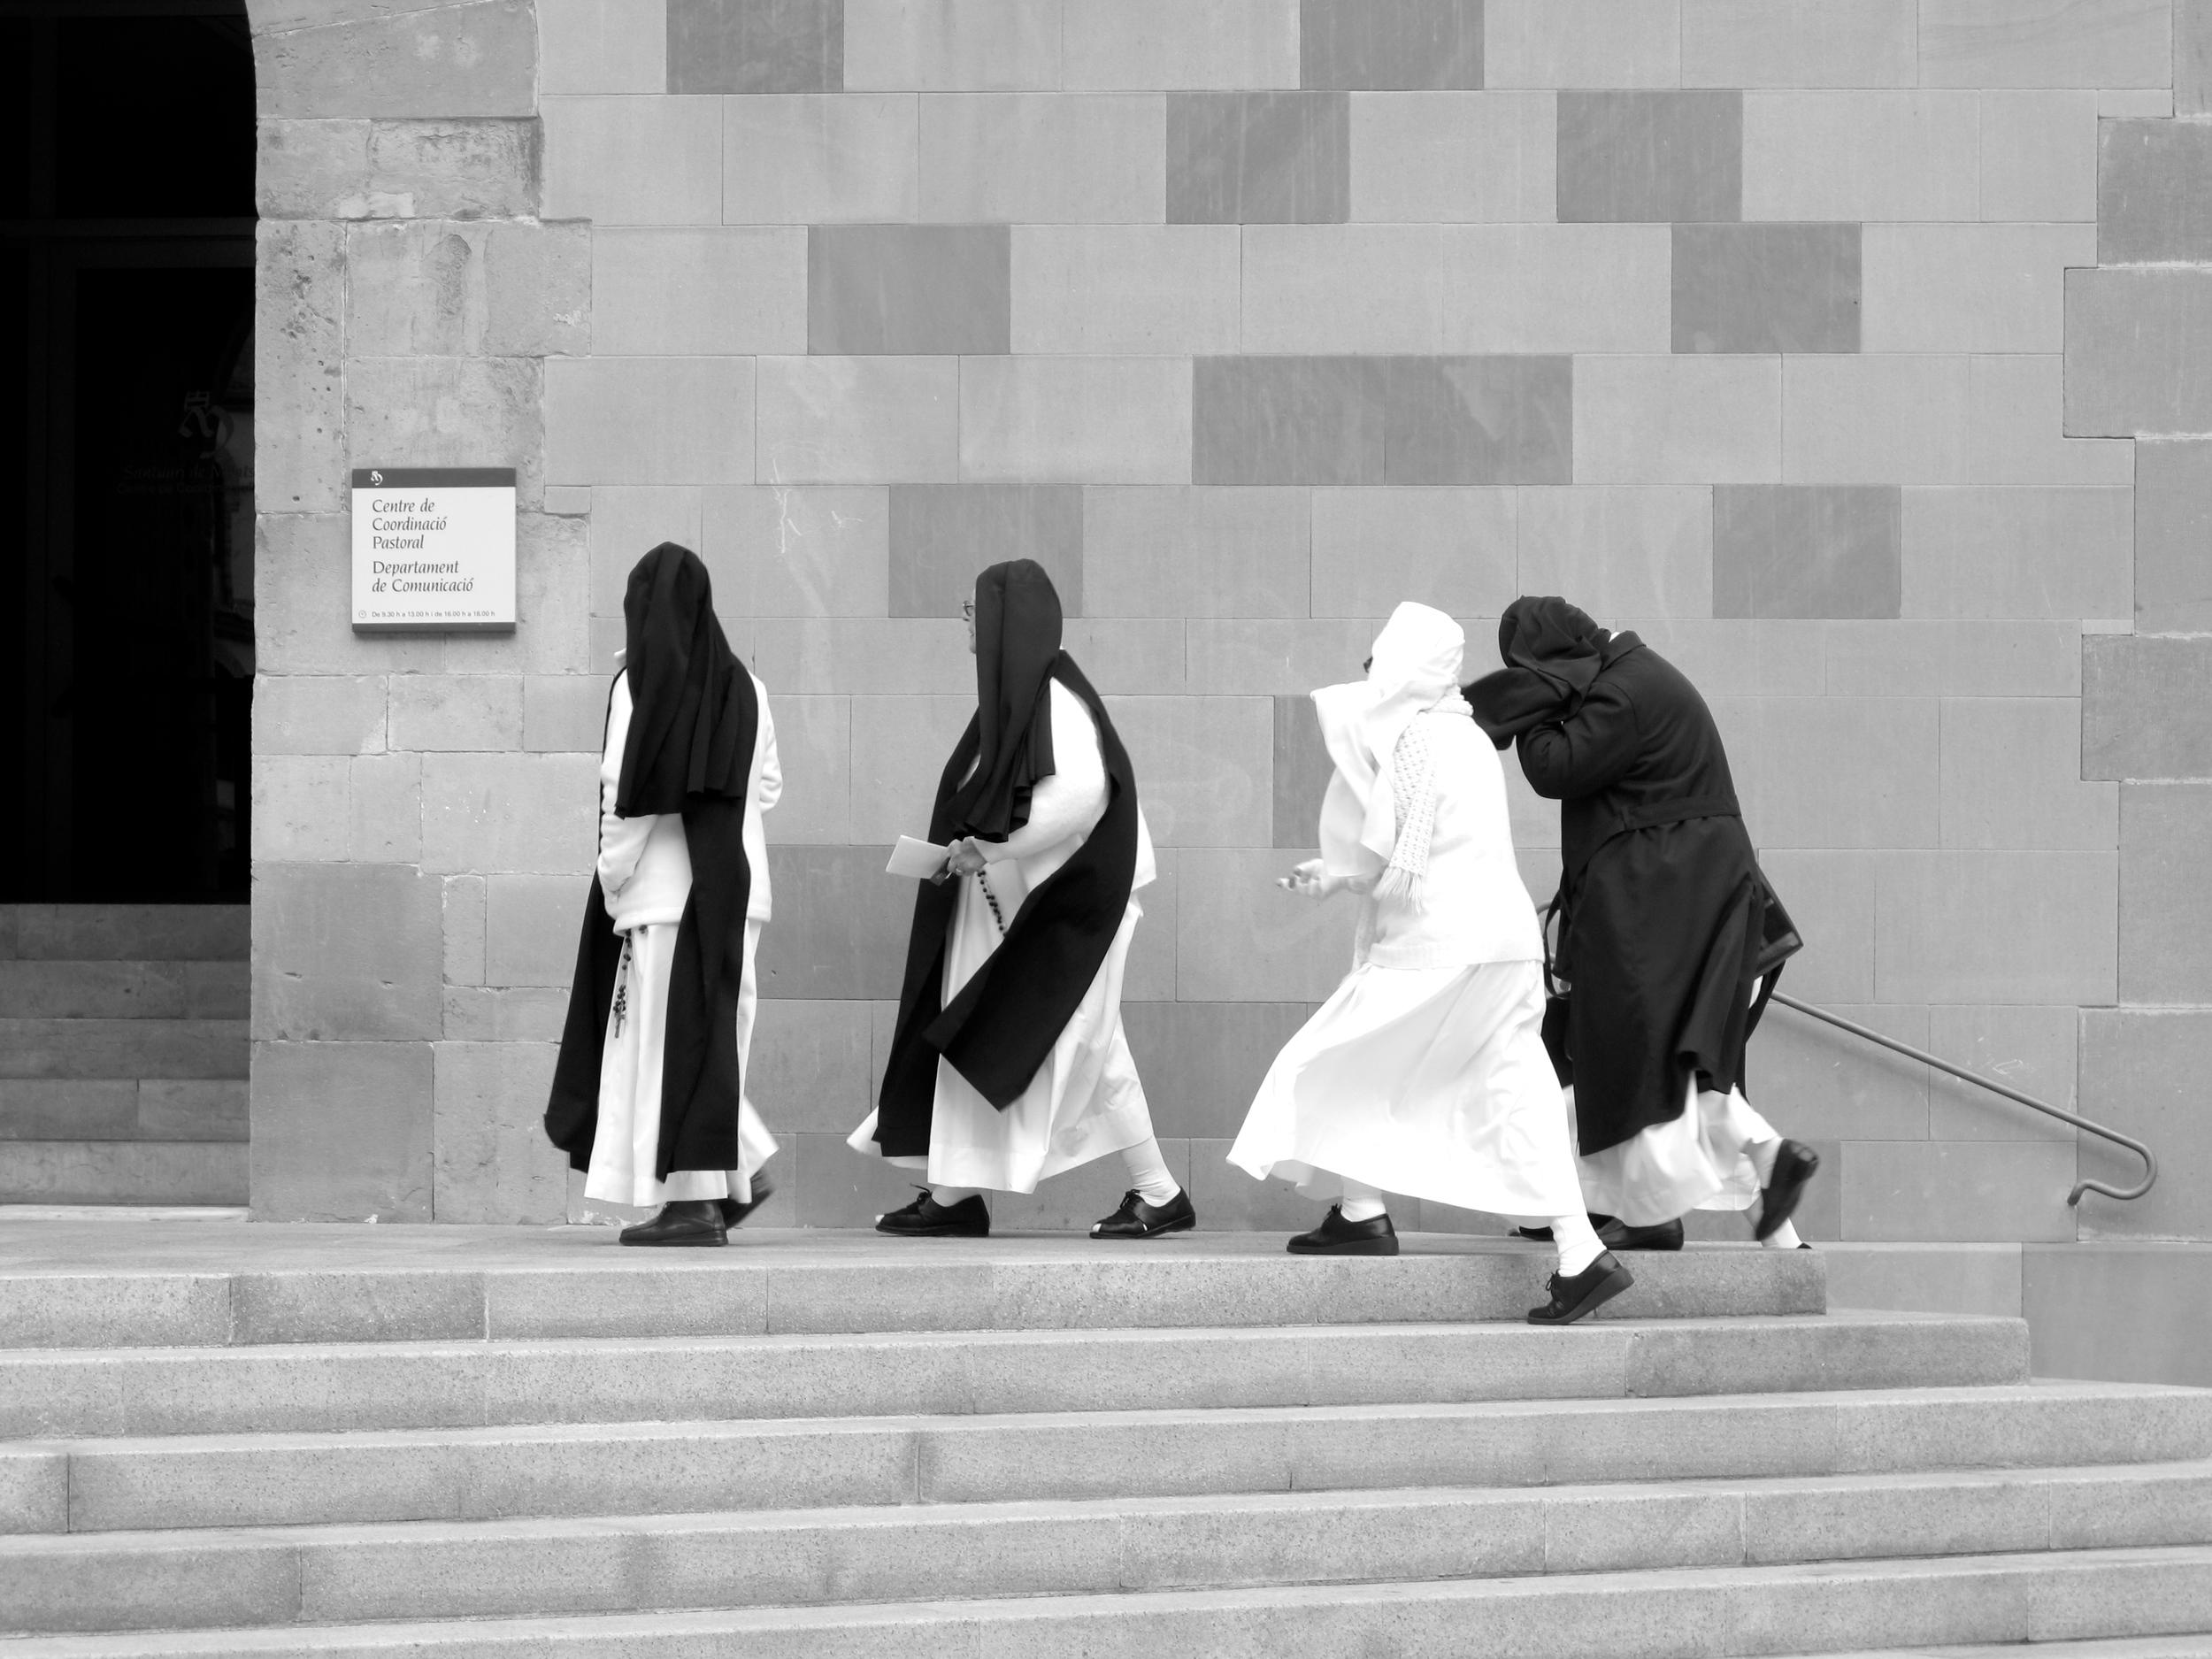 Nuns battling the wind at the monastery of Montserrat, Catalonia